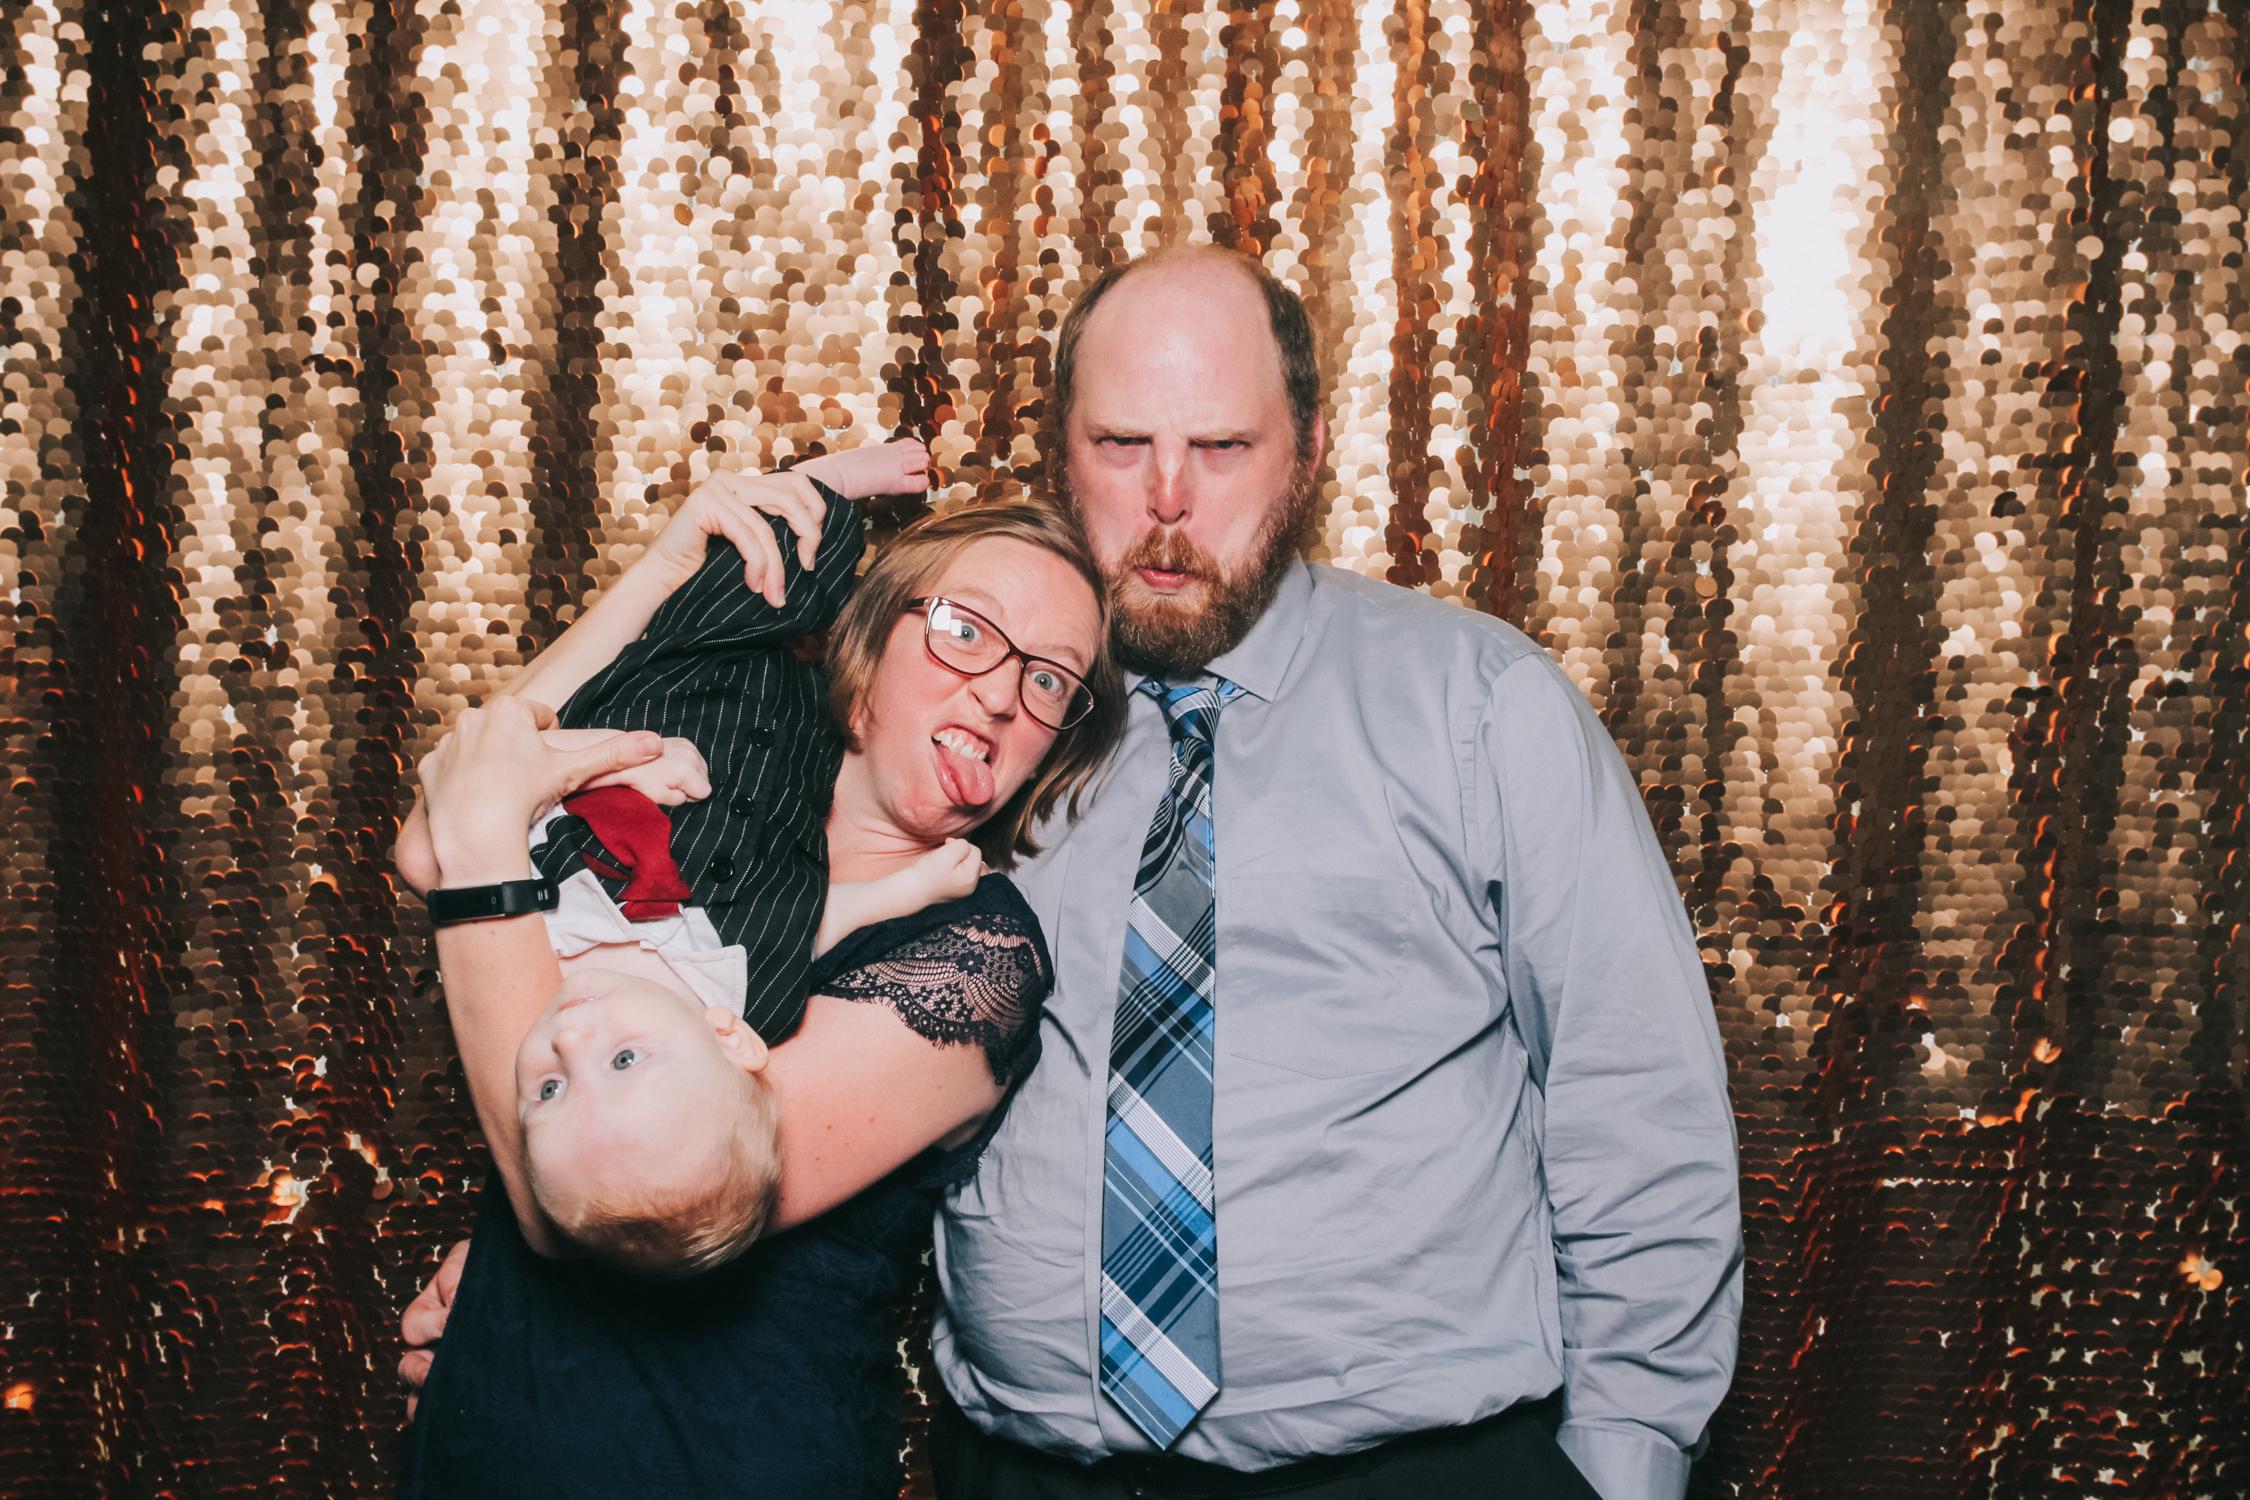 baltimore rusty scupper wedding photo booth-18.jpg